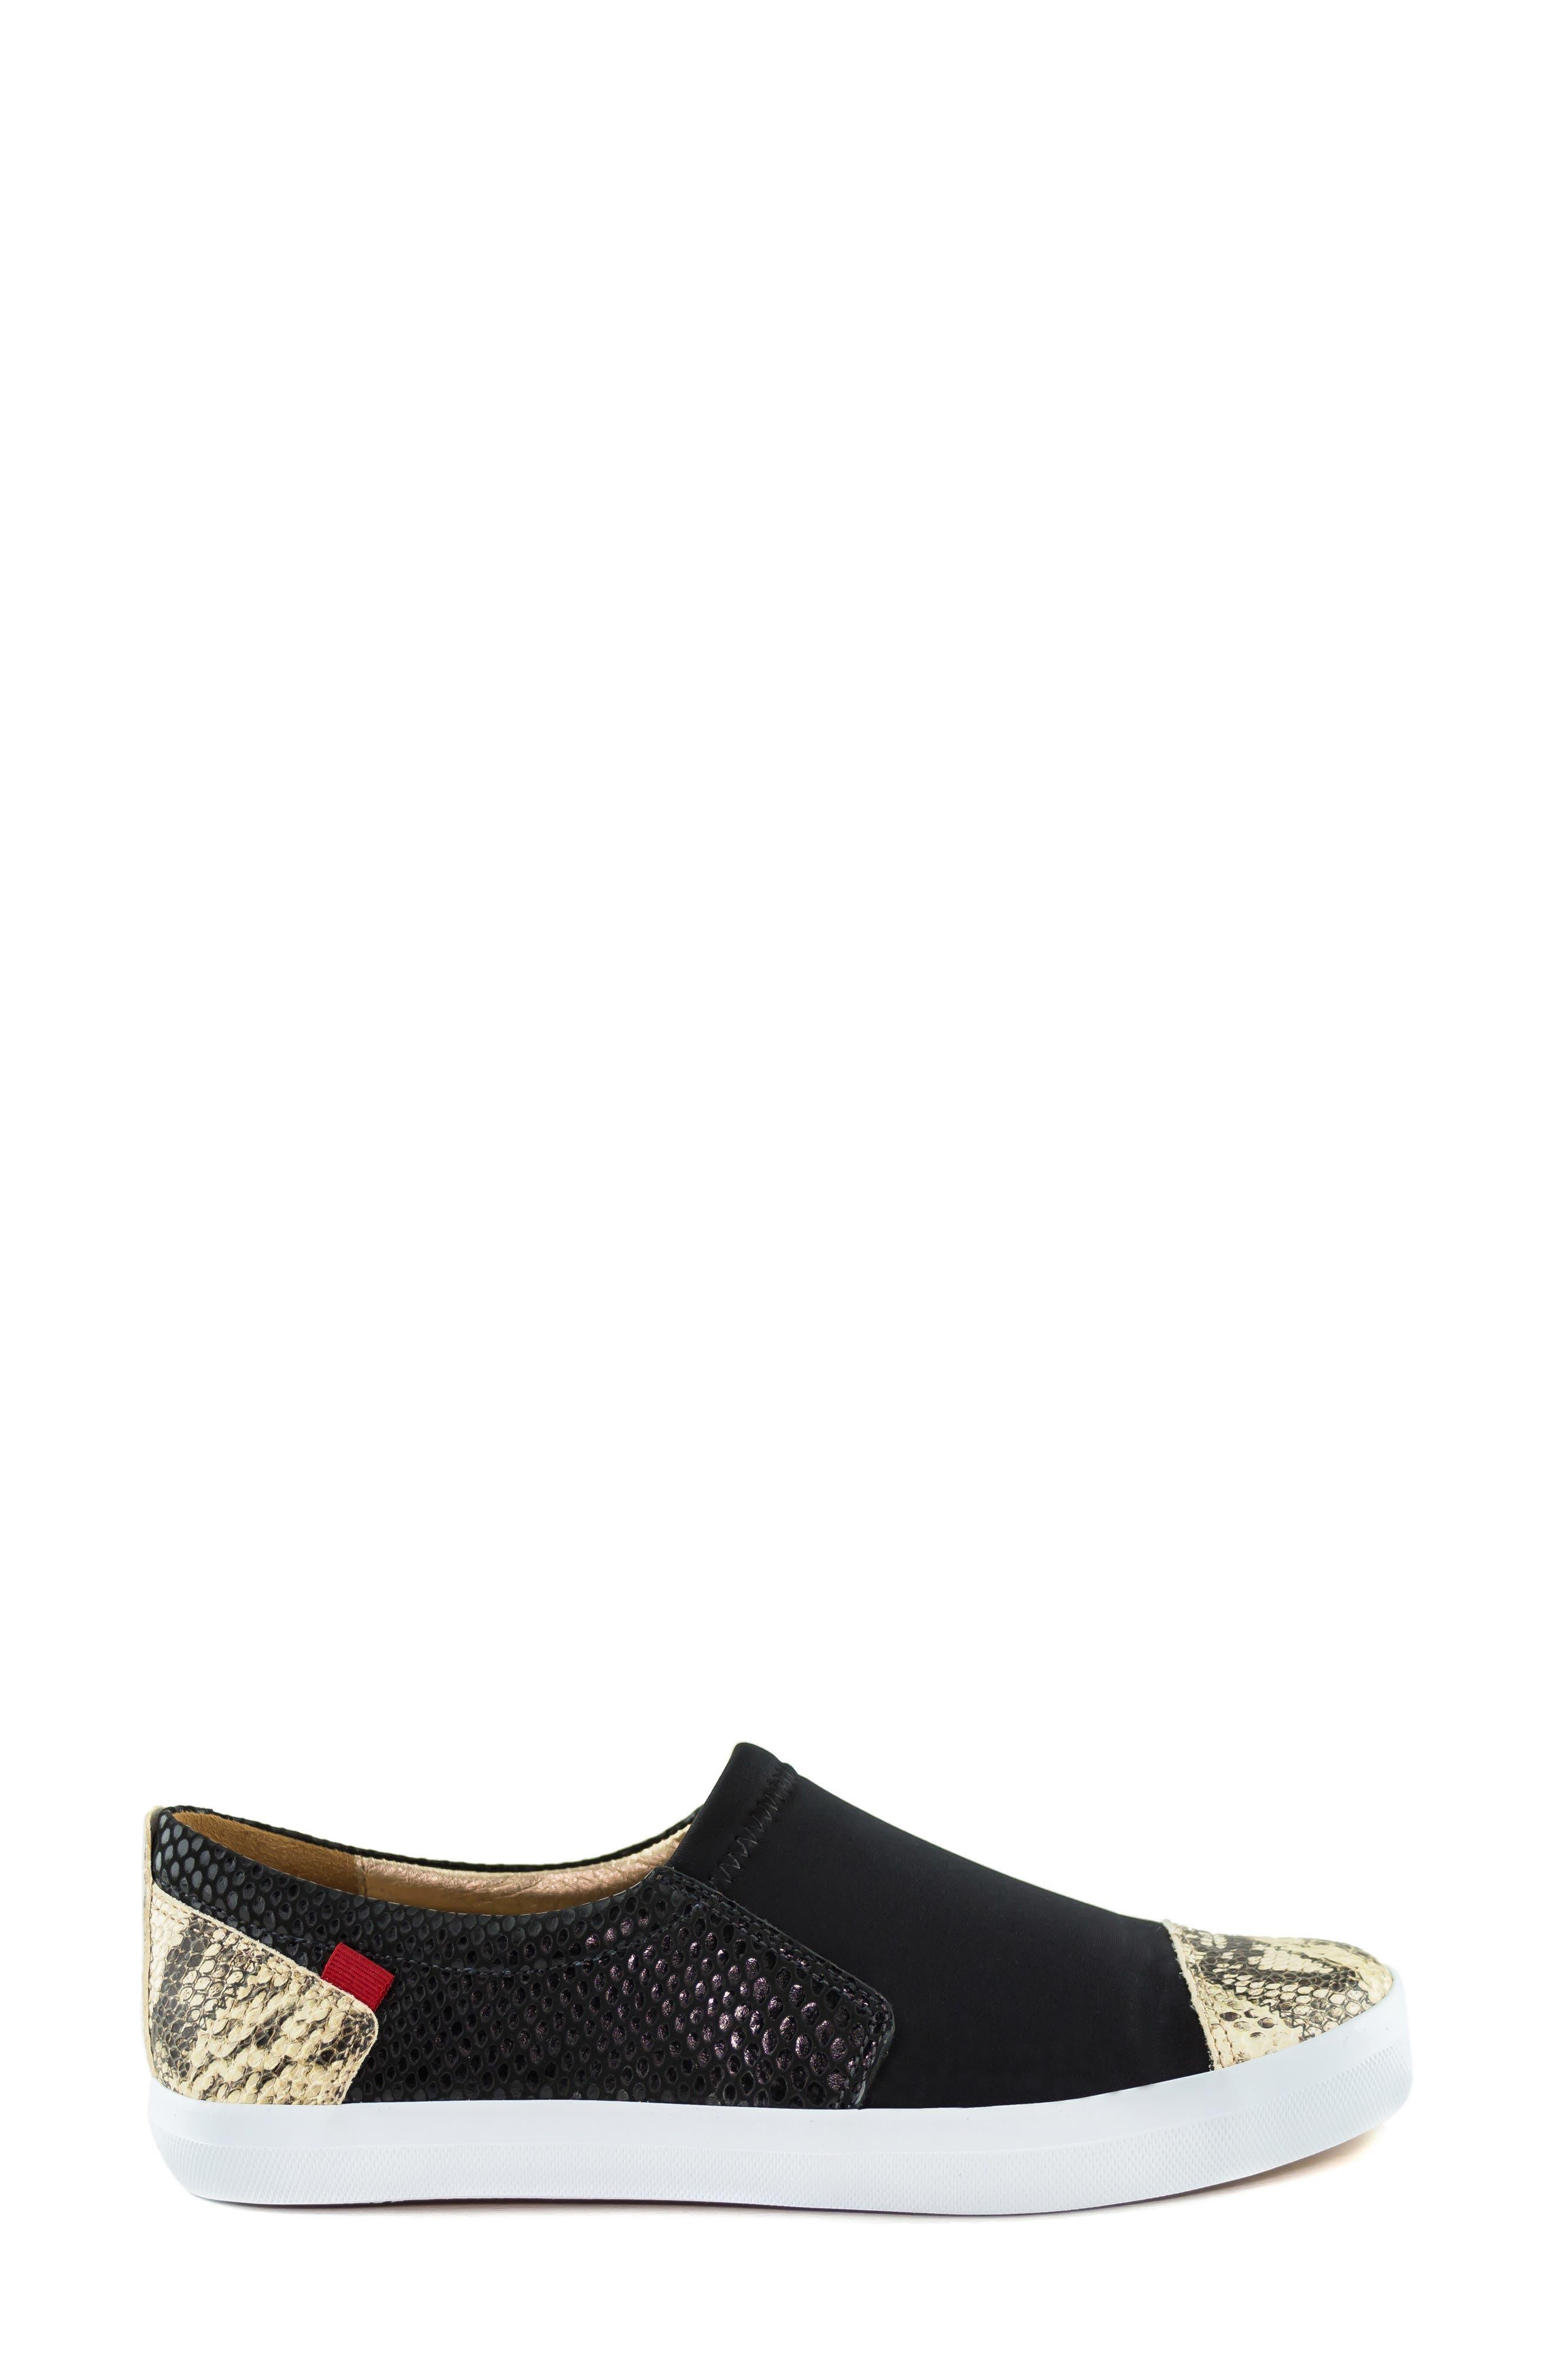 MARC JOSEPH NEW YORK, Jay Street Sneaker, Alternate thumbnail 3, color, BLACK PATCHWORK